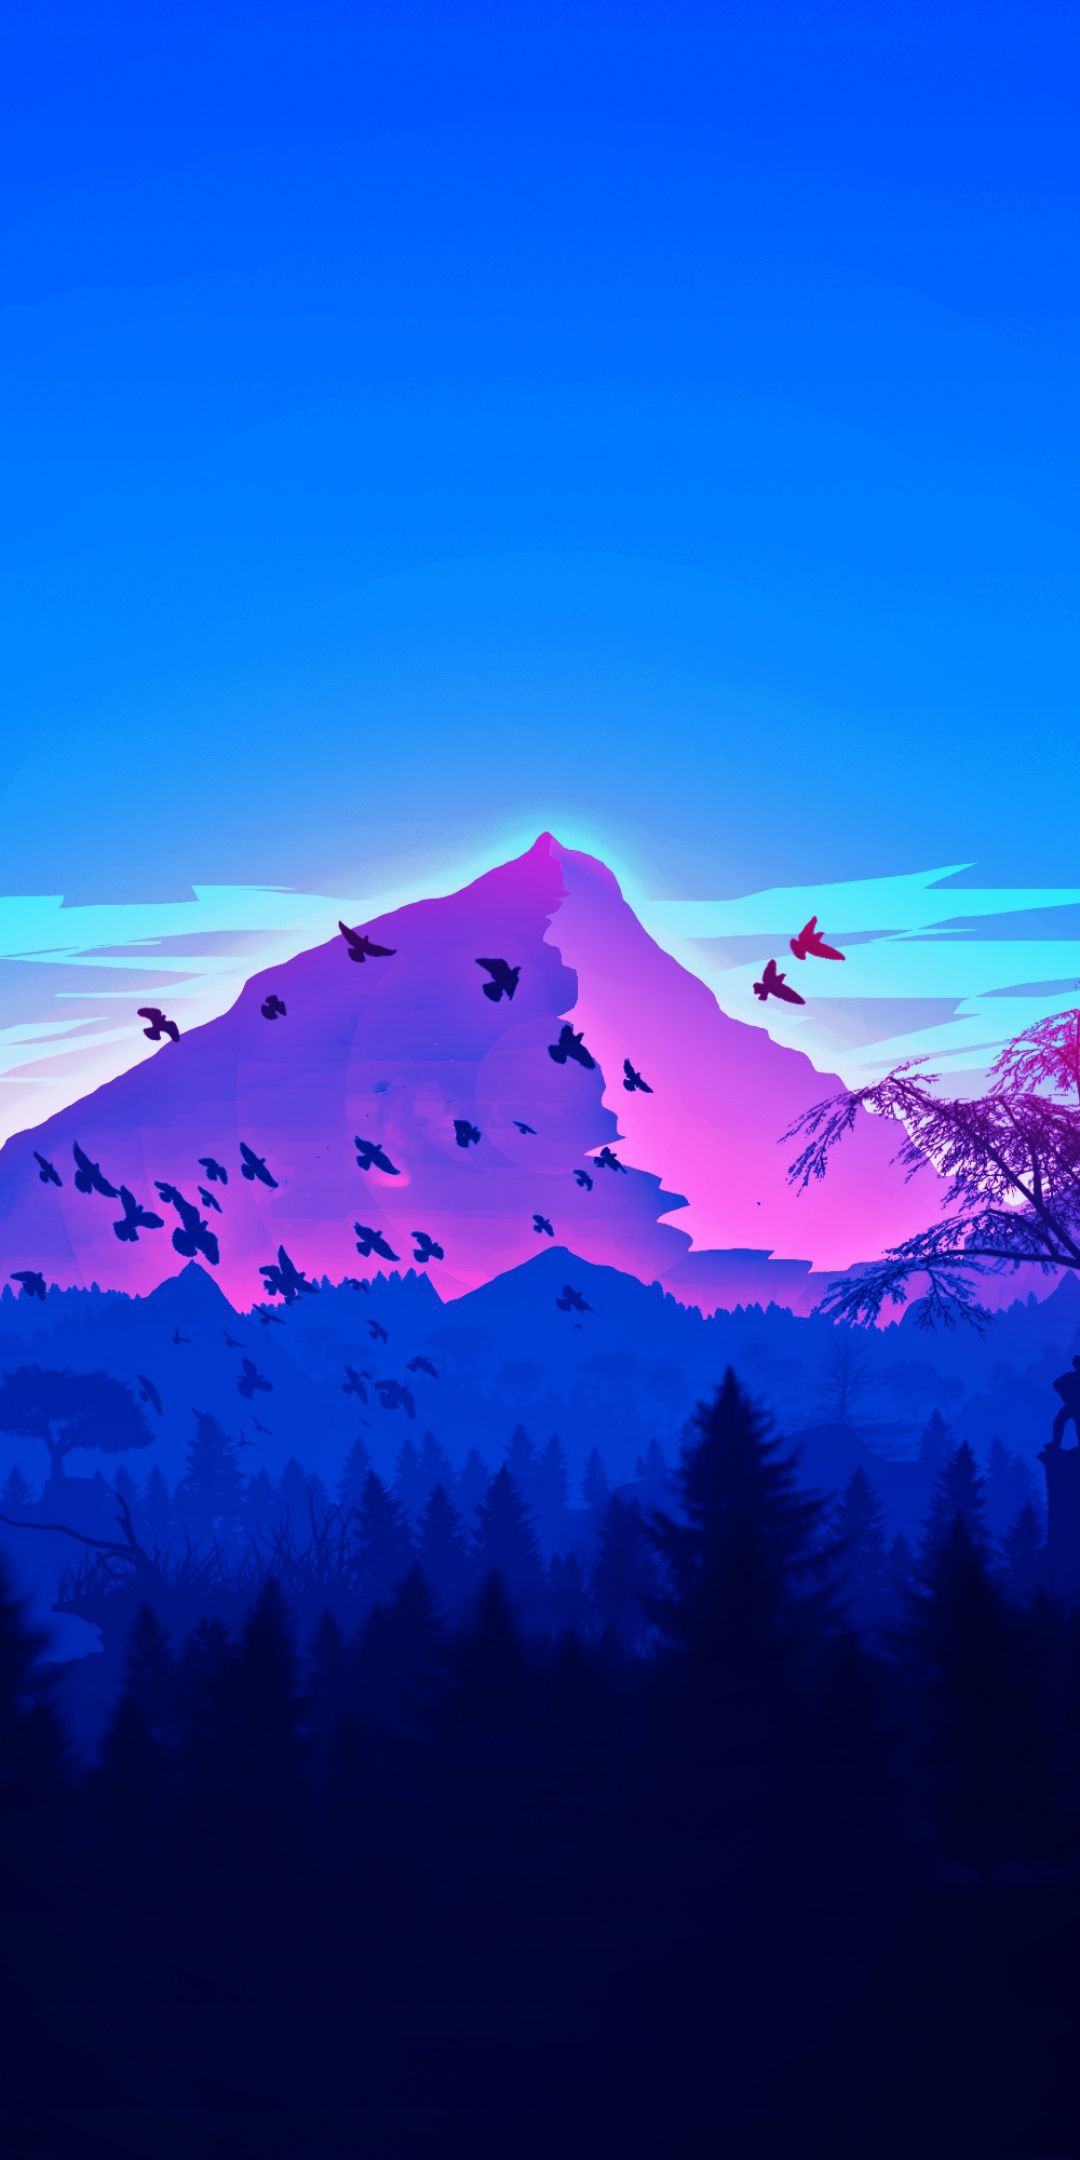 Mountain Peaks Birds Horizon Digital Art 1080x2160 Wallpaper